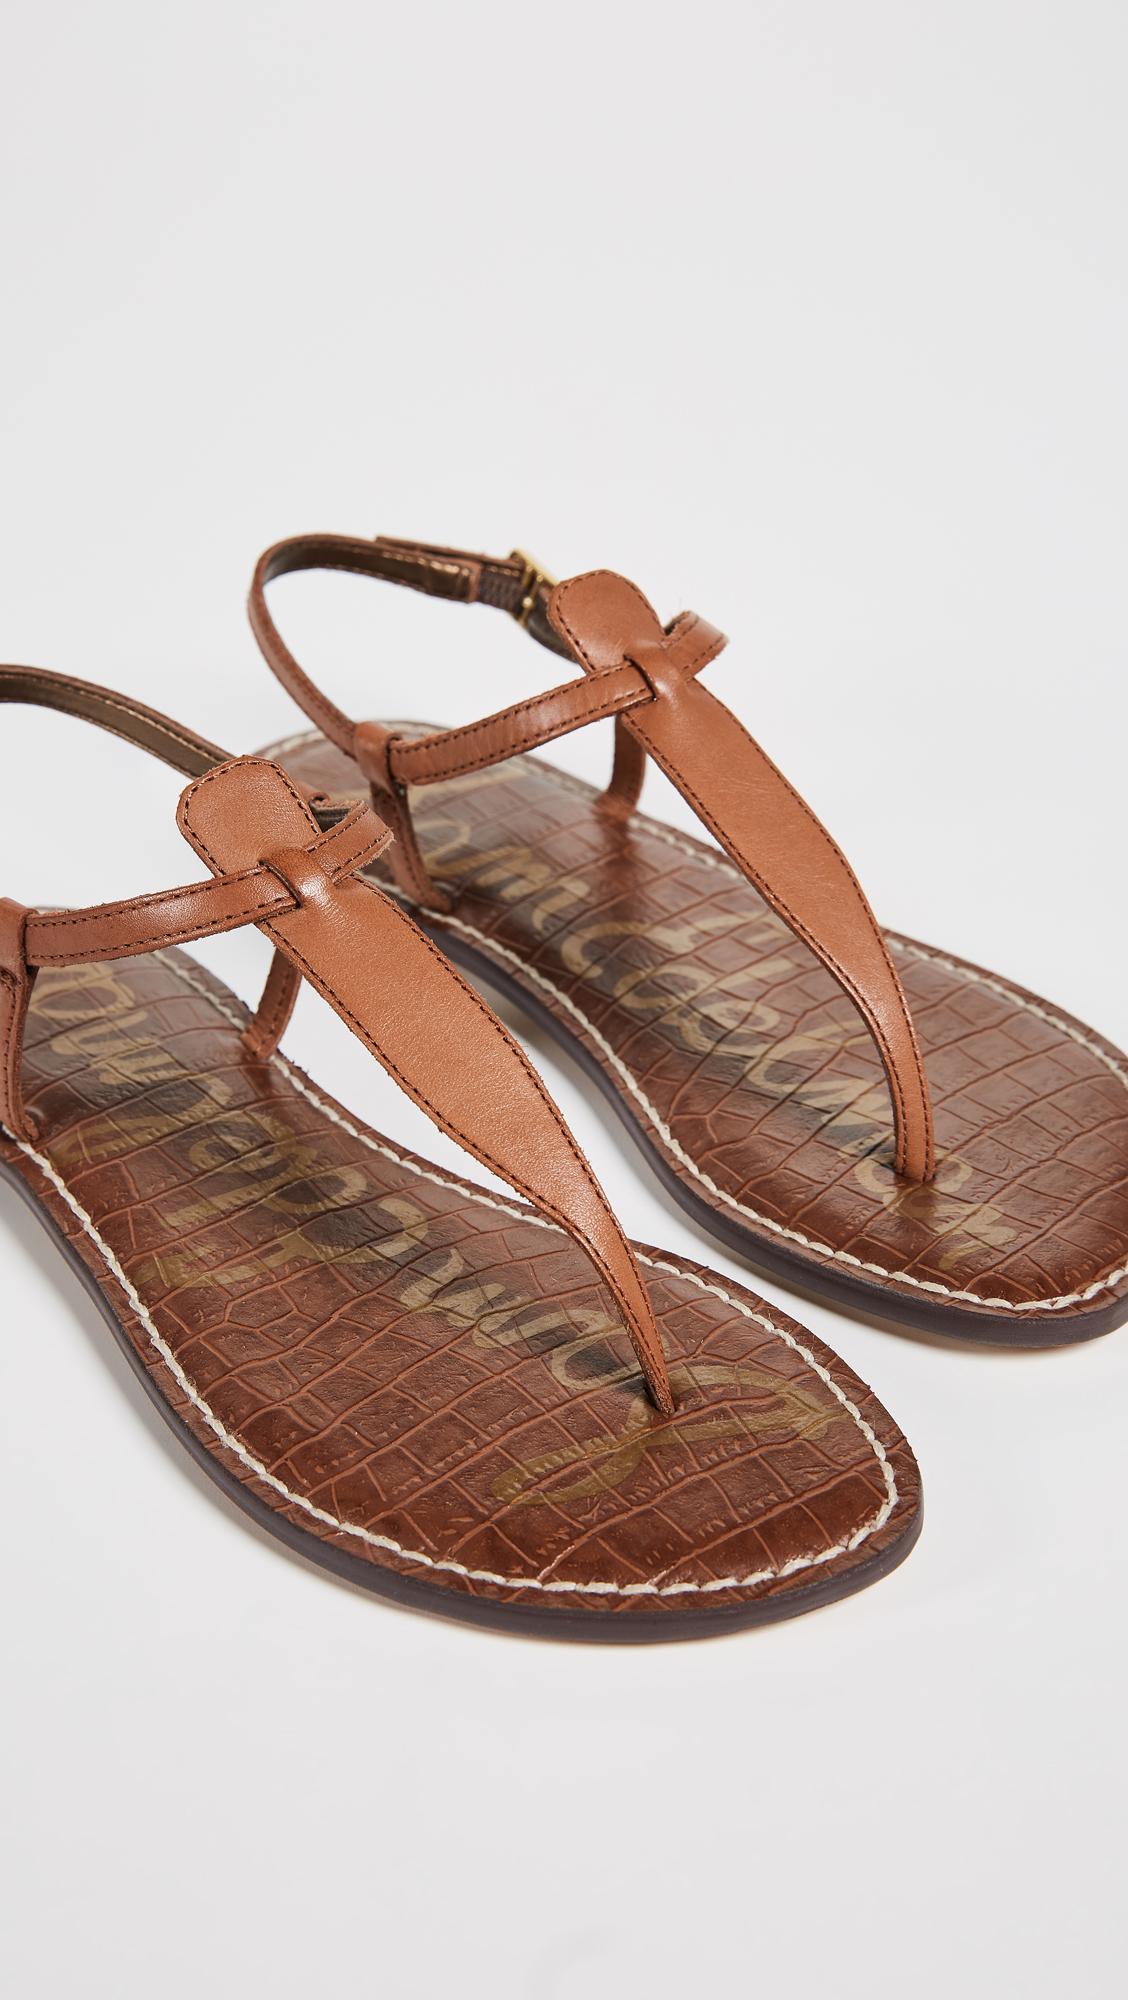 3779458eb731 Sam Edelman Gigi Flat Sandals